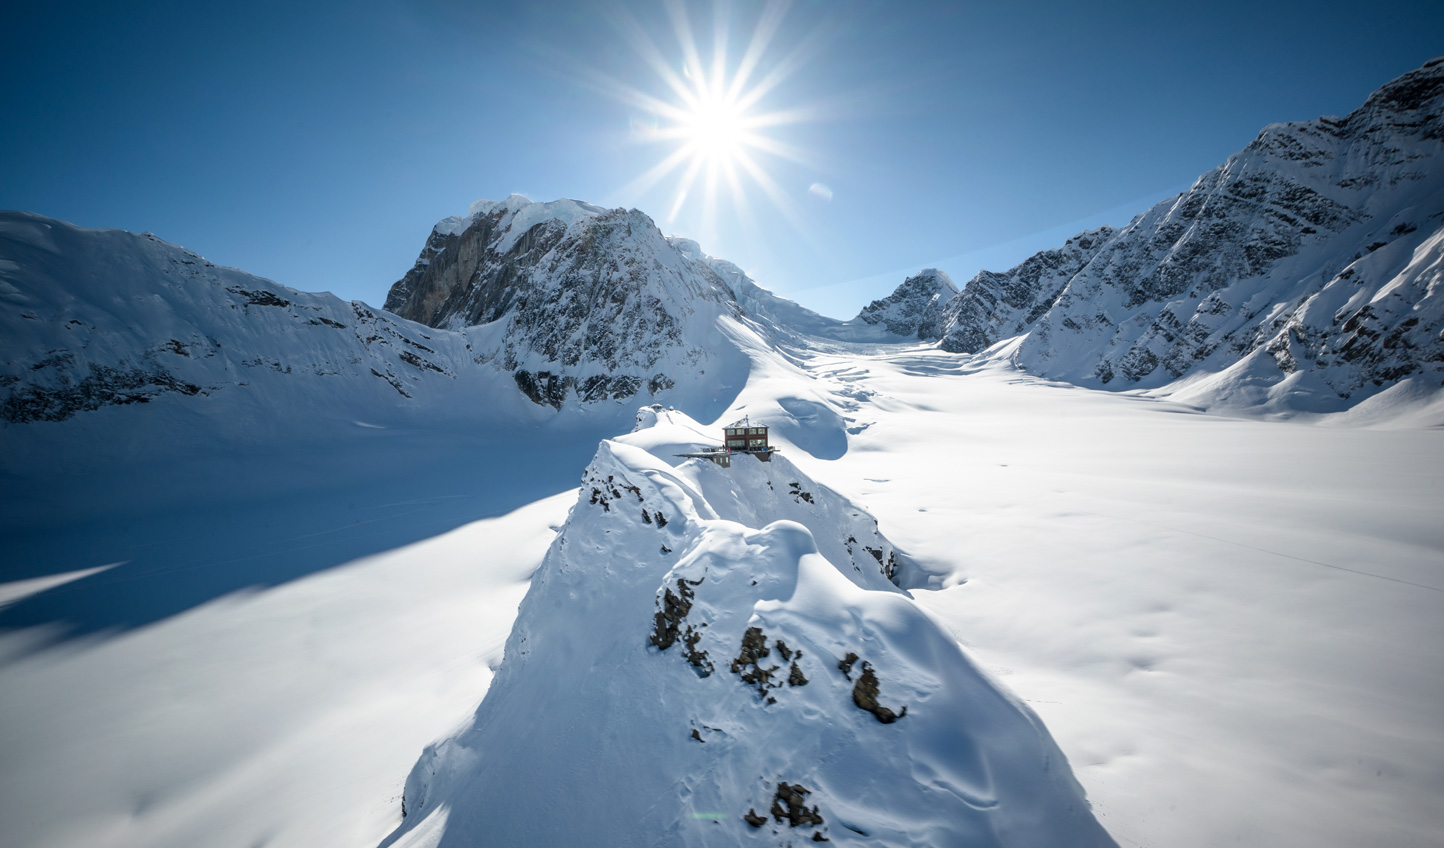 Set deep within Denali National Park, Sheldon invites adventure